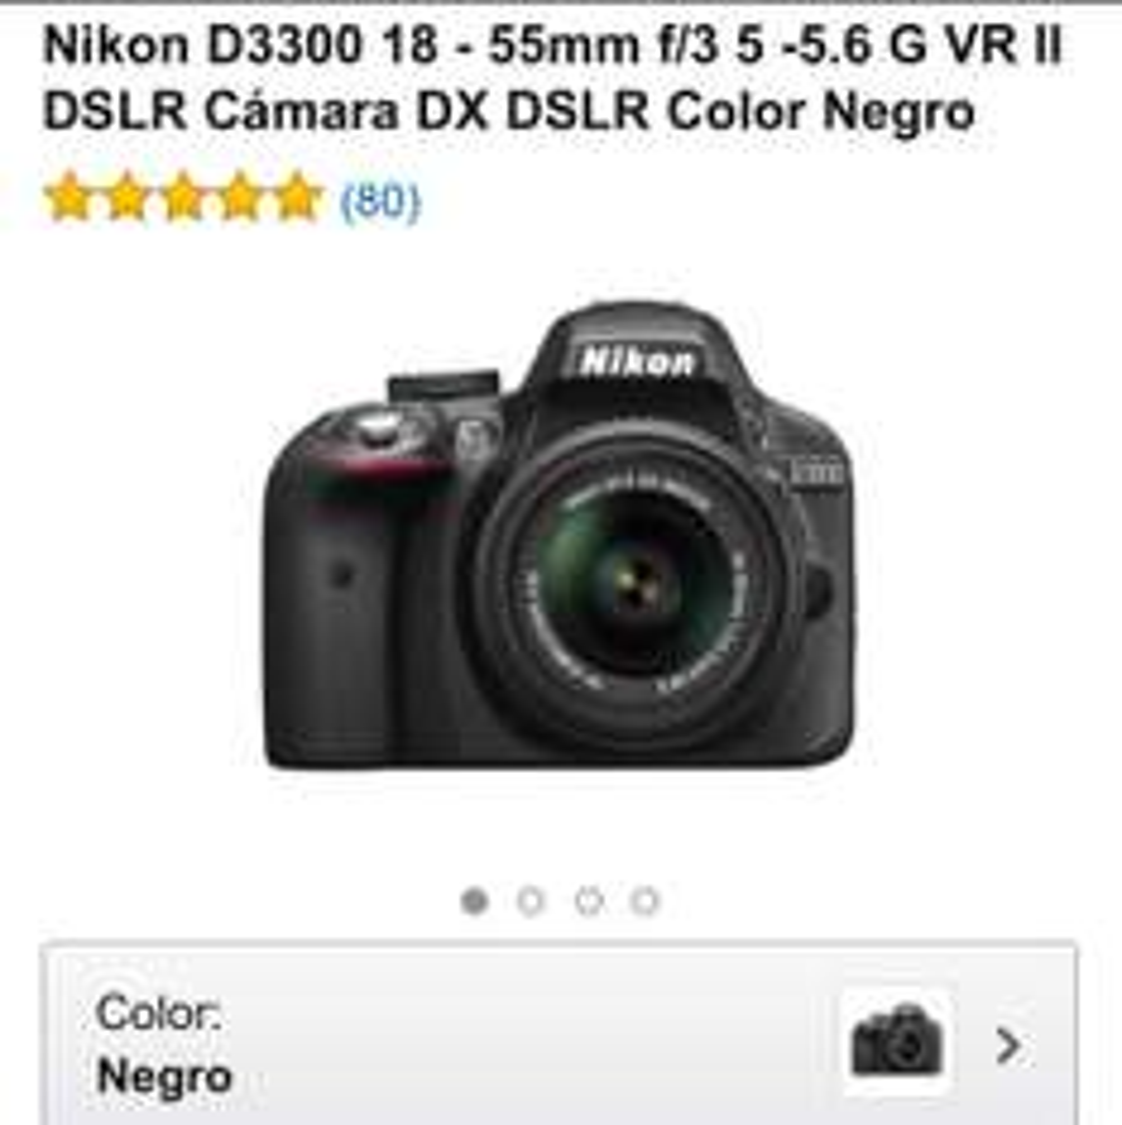 Ofertas Hot Sale Amazon: cámara Nikon D3300 $5,415 con bonificación banamex